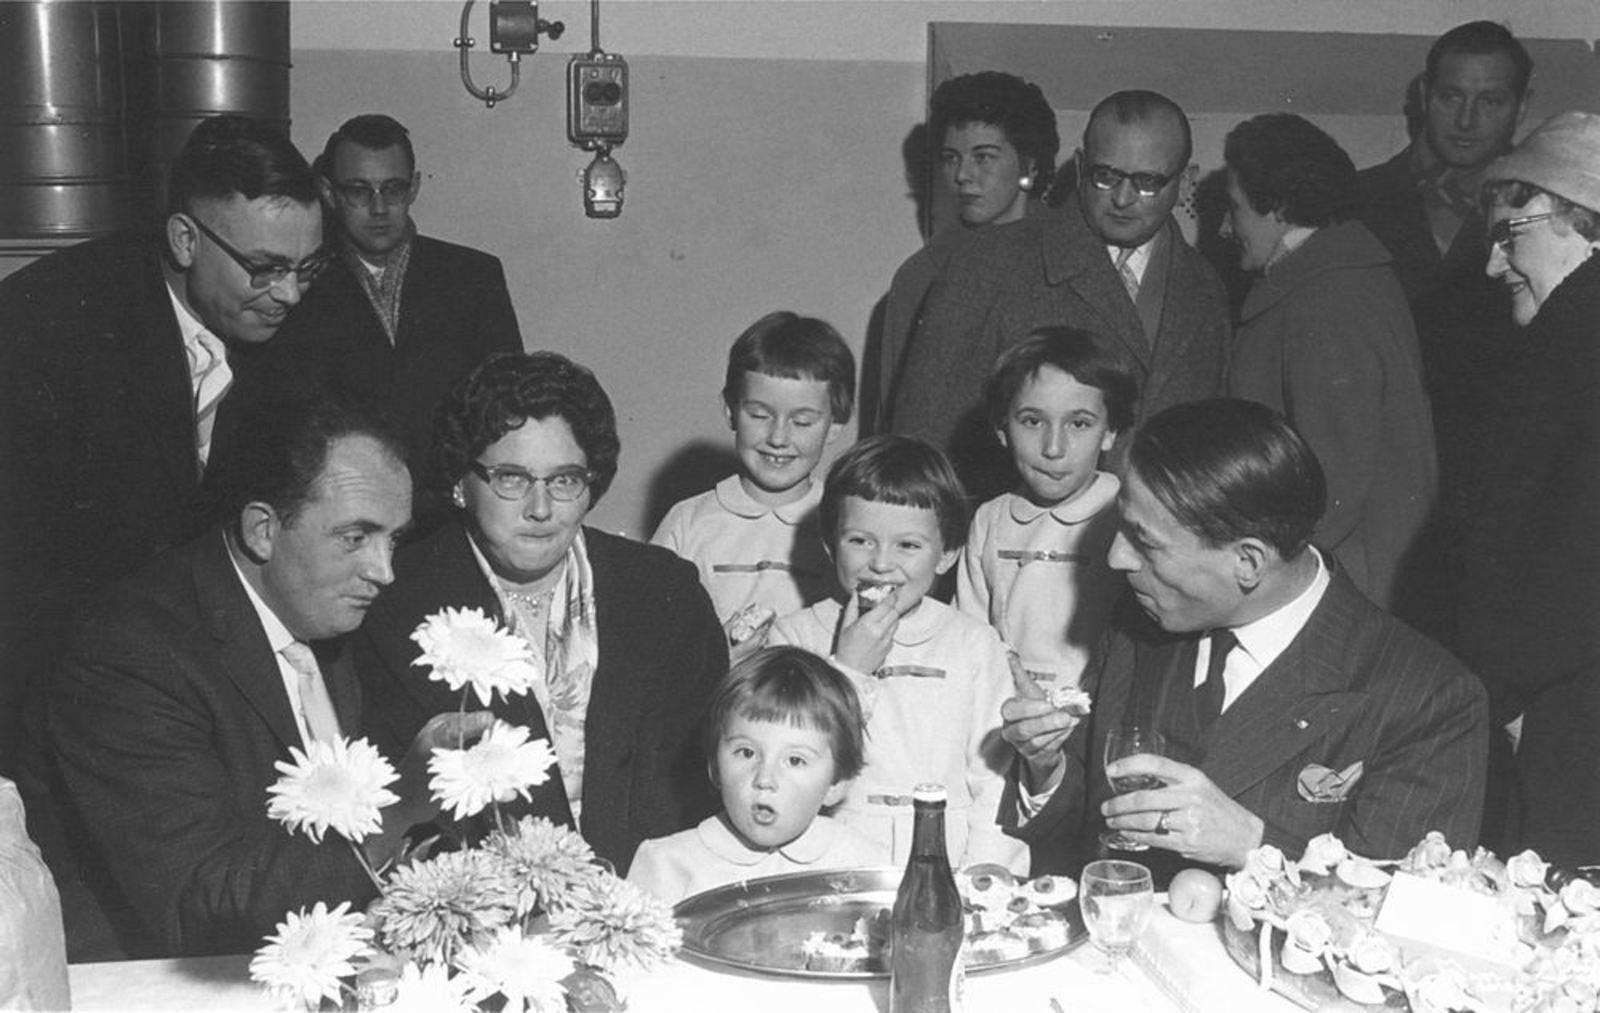 Dam Gilles 1922 1959 Opening Chips Fabriek 02